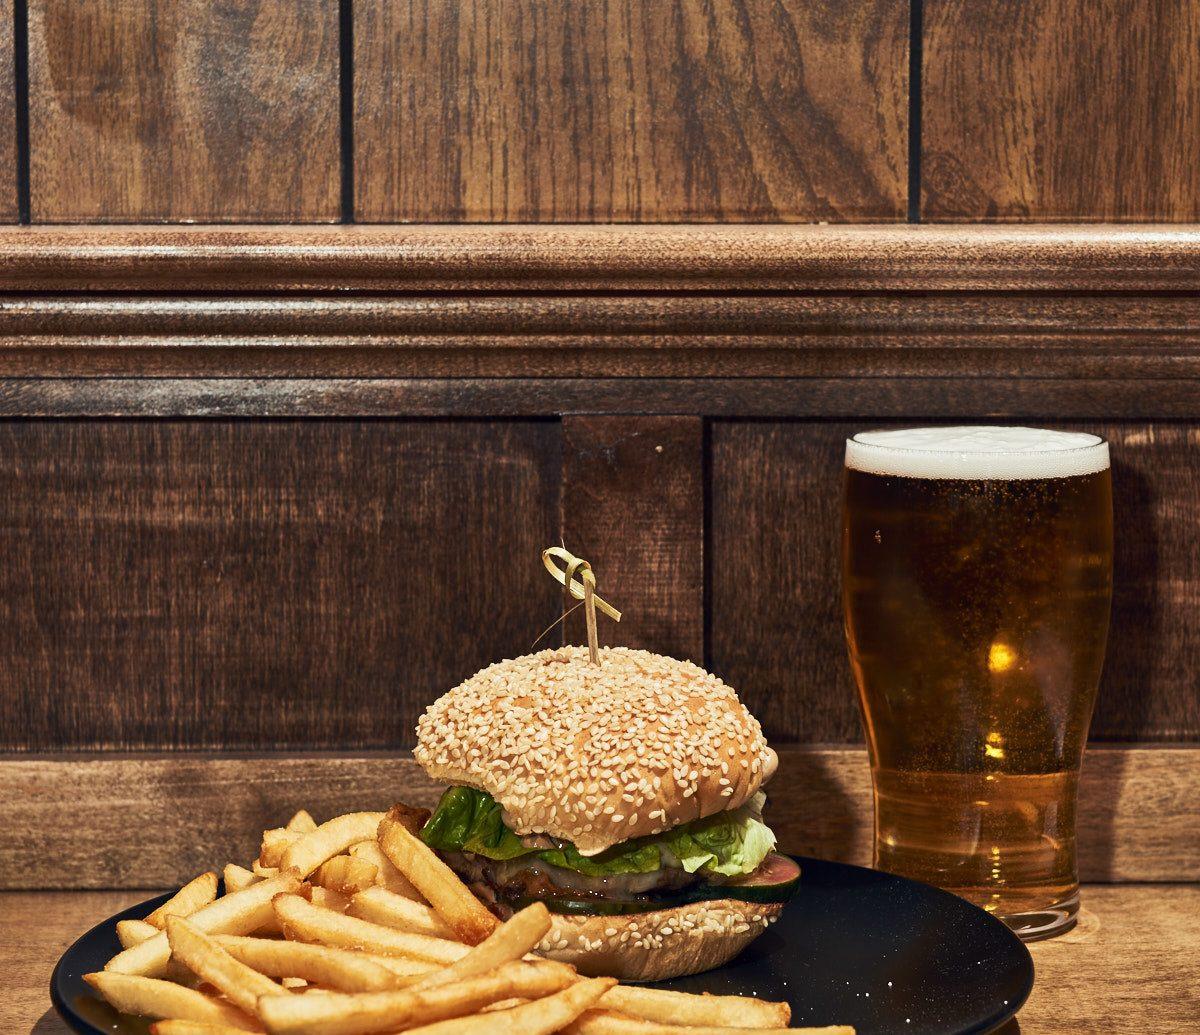 Food + Drink Trip Ideas table food fast food dish wooden junk food cuisine finger food hamburger still life sandwich